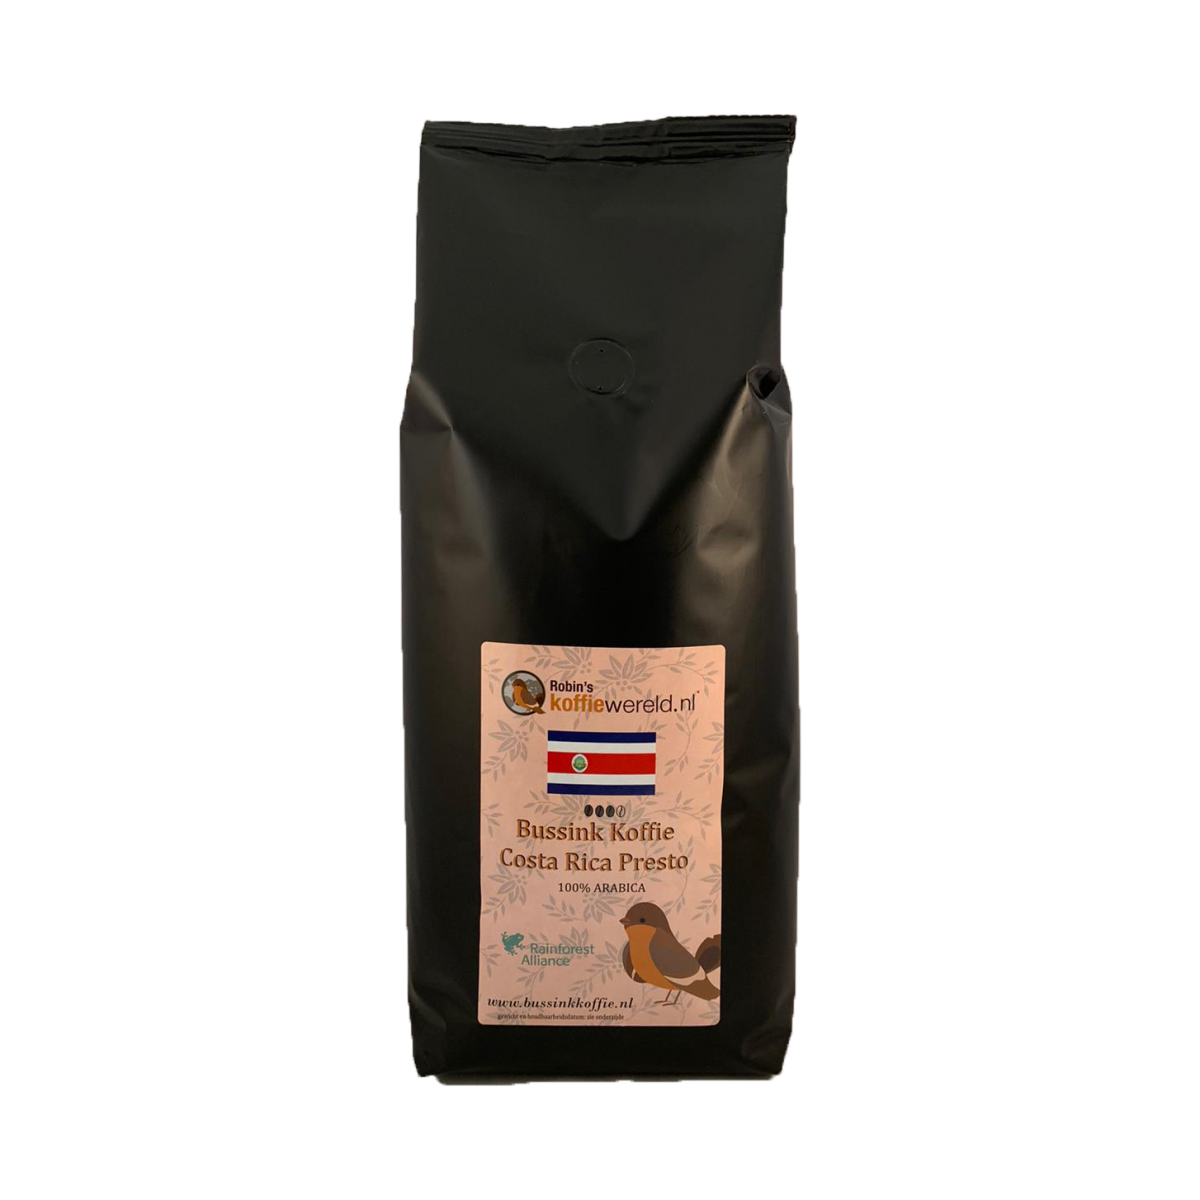 Bussink Koffie Costa Rica Presto 1 stuk 2020